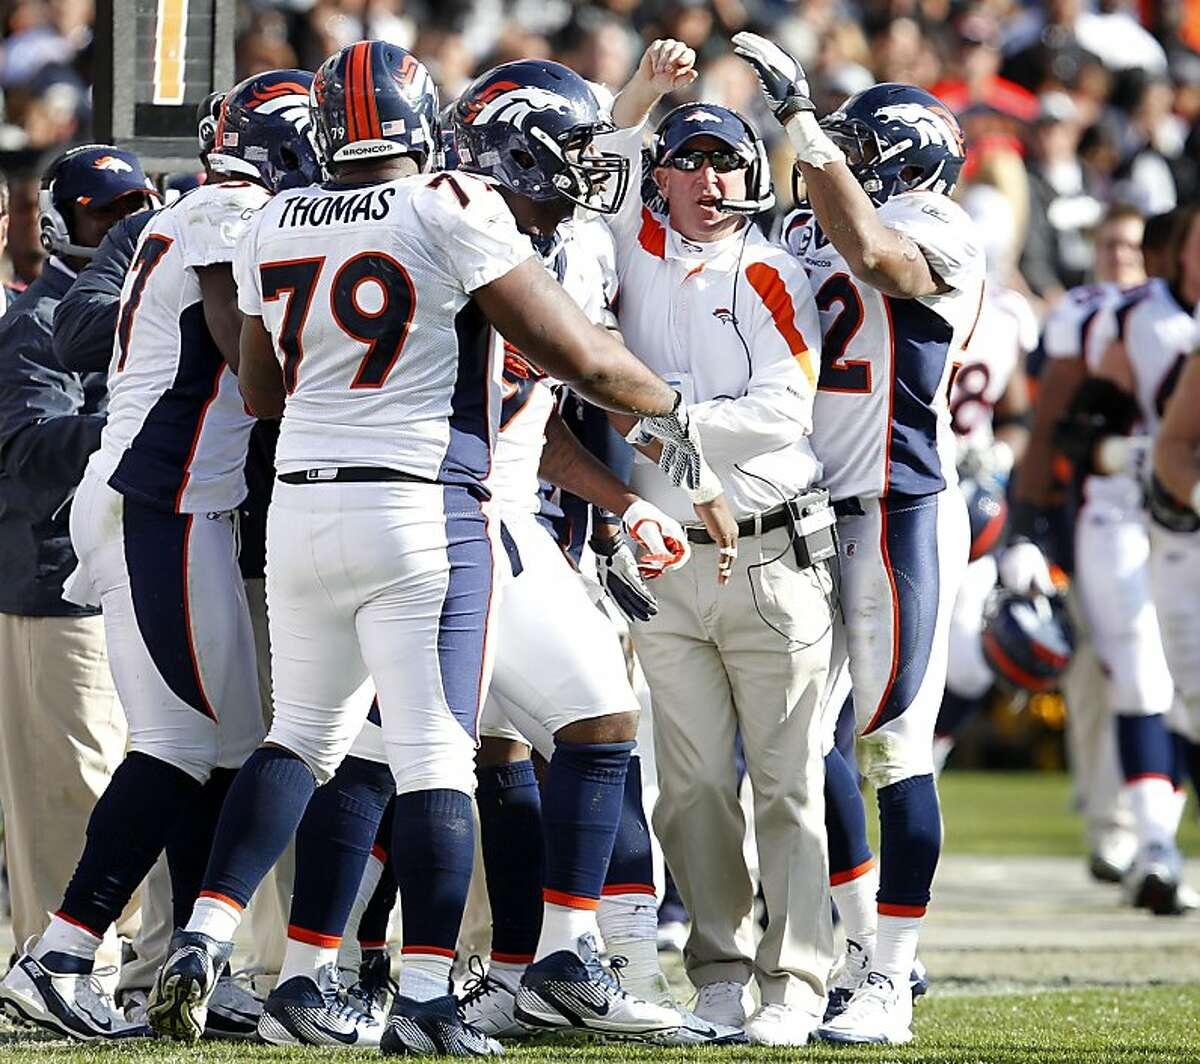 The Denver Broncos team and heach coach John Fox, center cheer as they defeat the Oakland Raiders, Sunday November 6, 2011, at O.co Coliseum in Oakland, Calif. The Broncos defeated the Raiders 38 to 24.